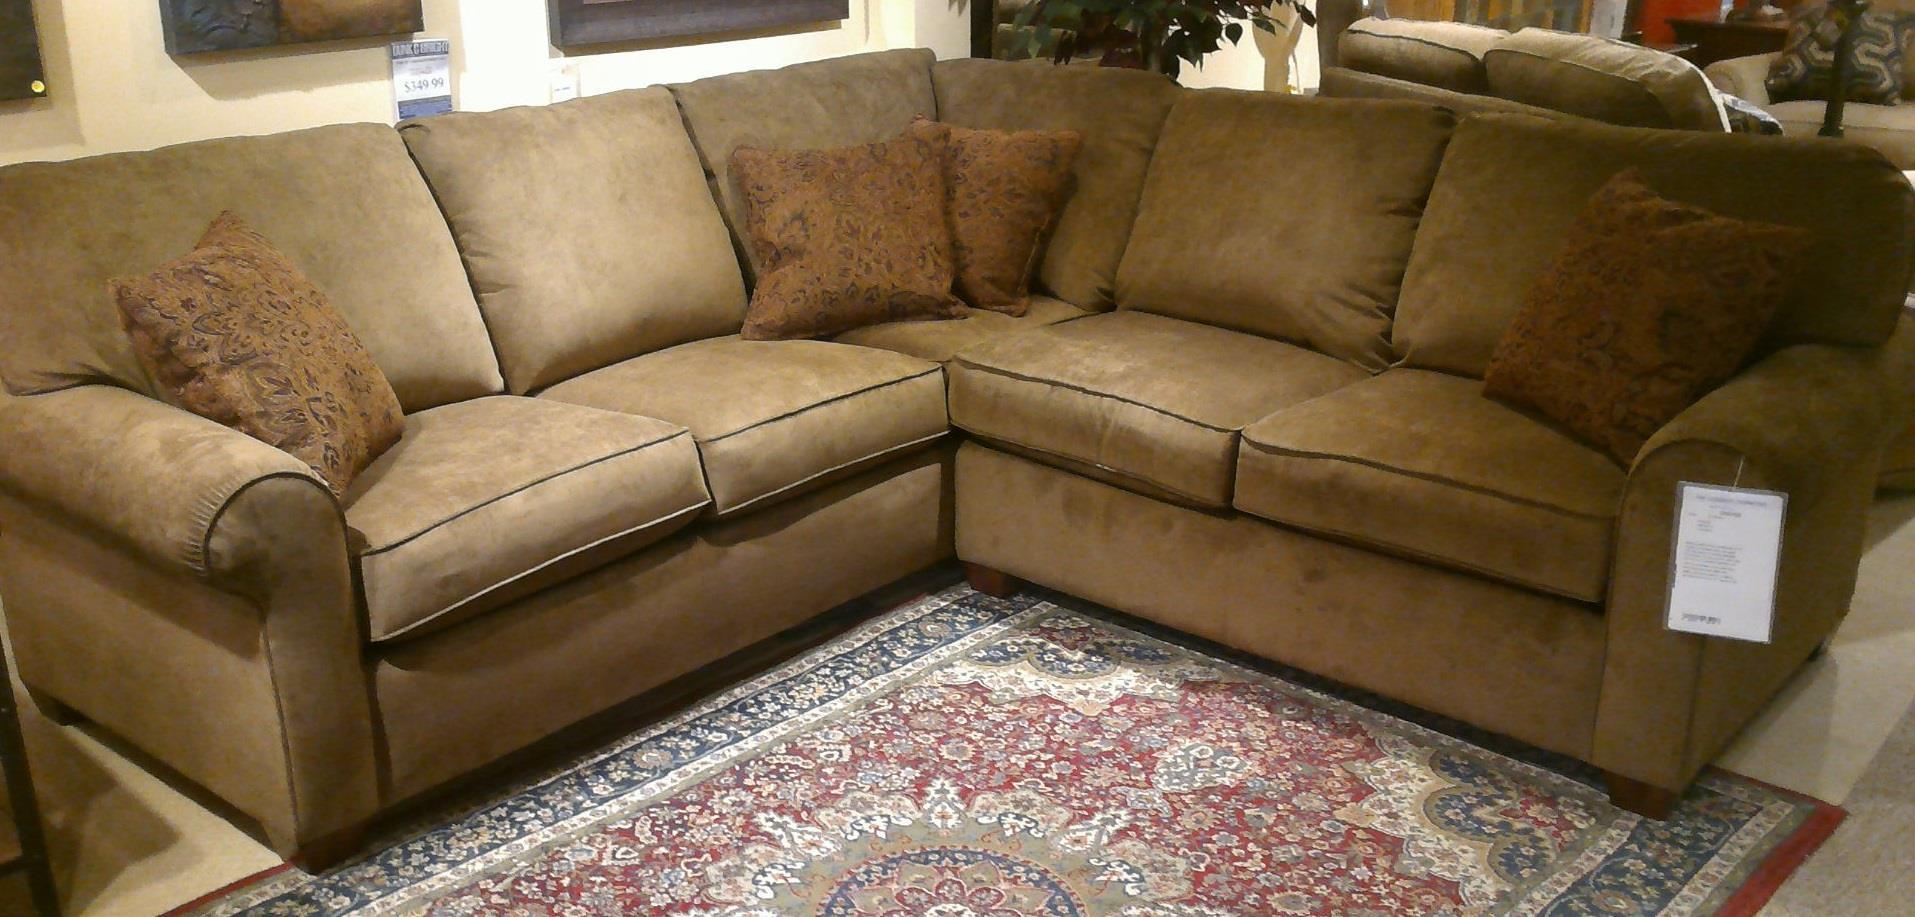 howell sofa chesterfield di malaysia flexsteel thornton price 3 piece